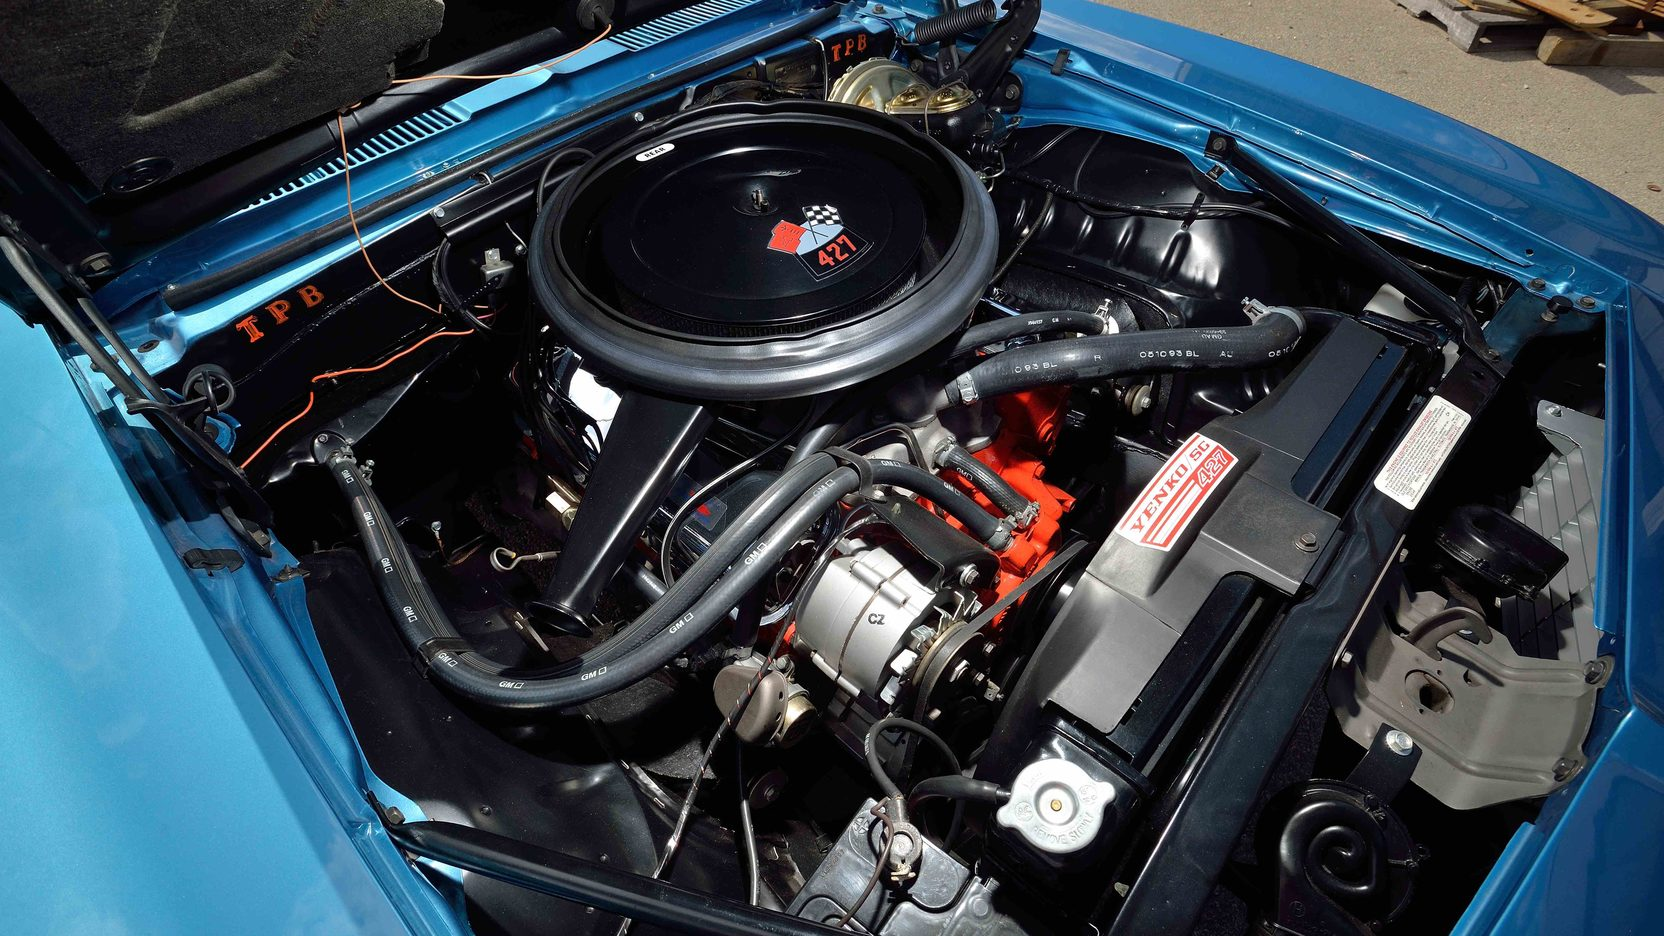 1969 Yenko Chevrolet Camaro Engine